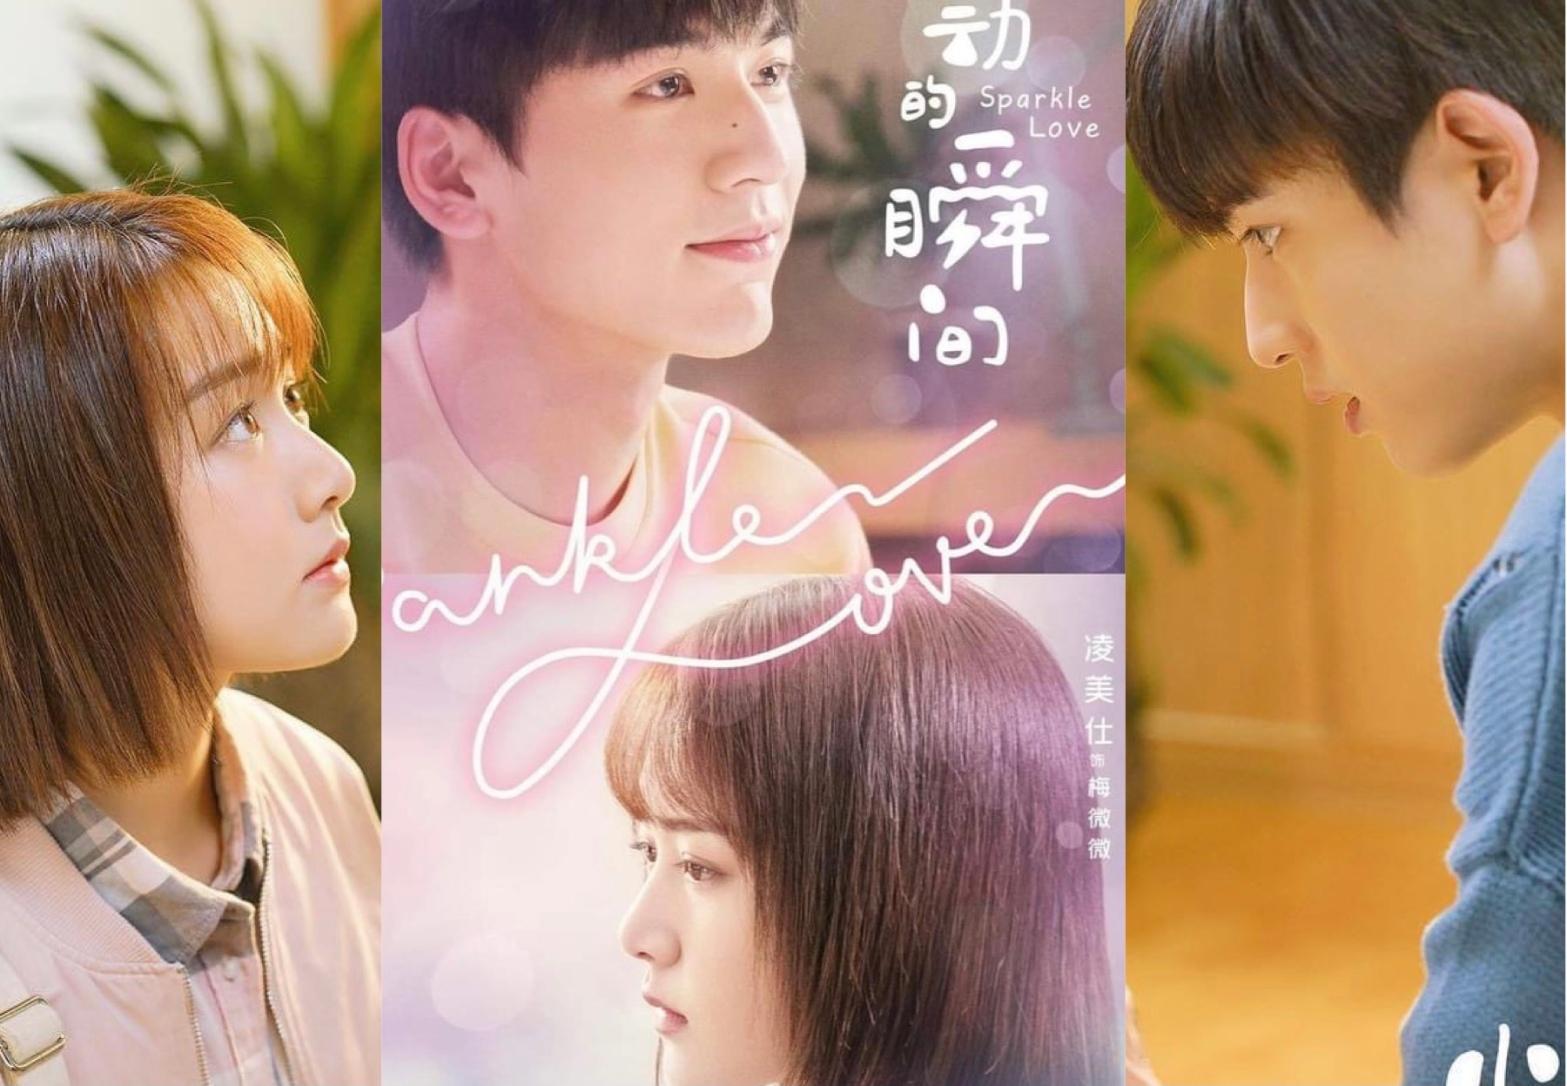 Sparkle Love 心动的瞬间 Drama poster